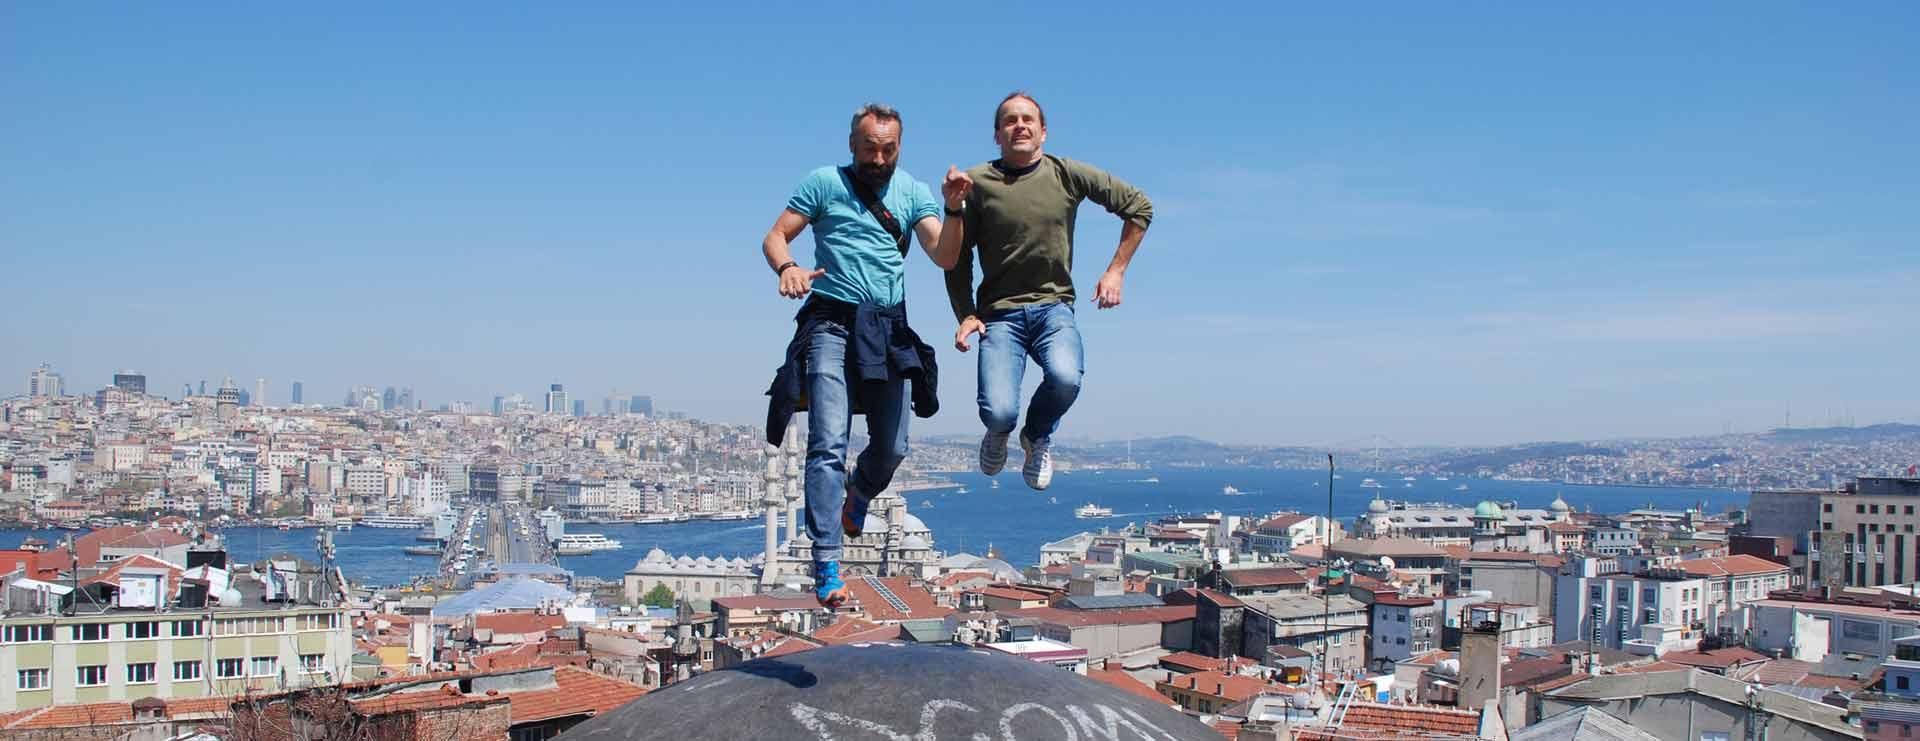 mediaPool goes Bosporus